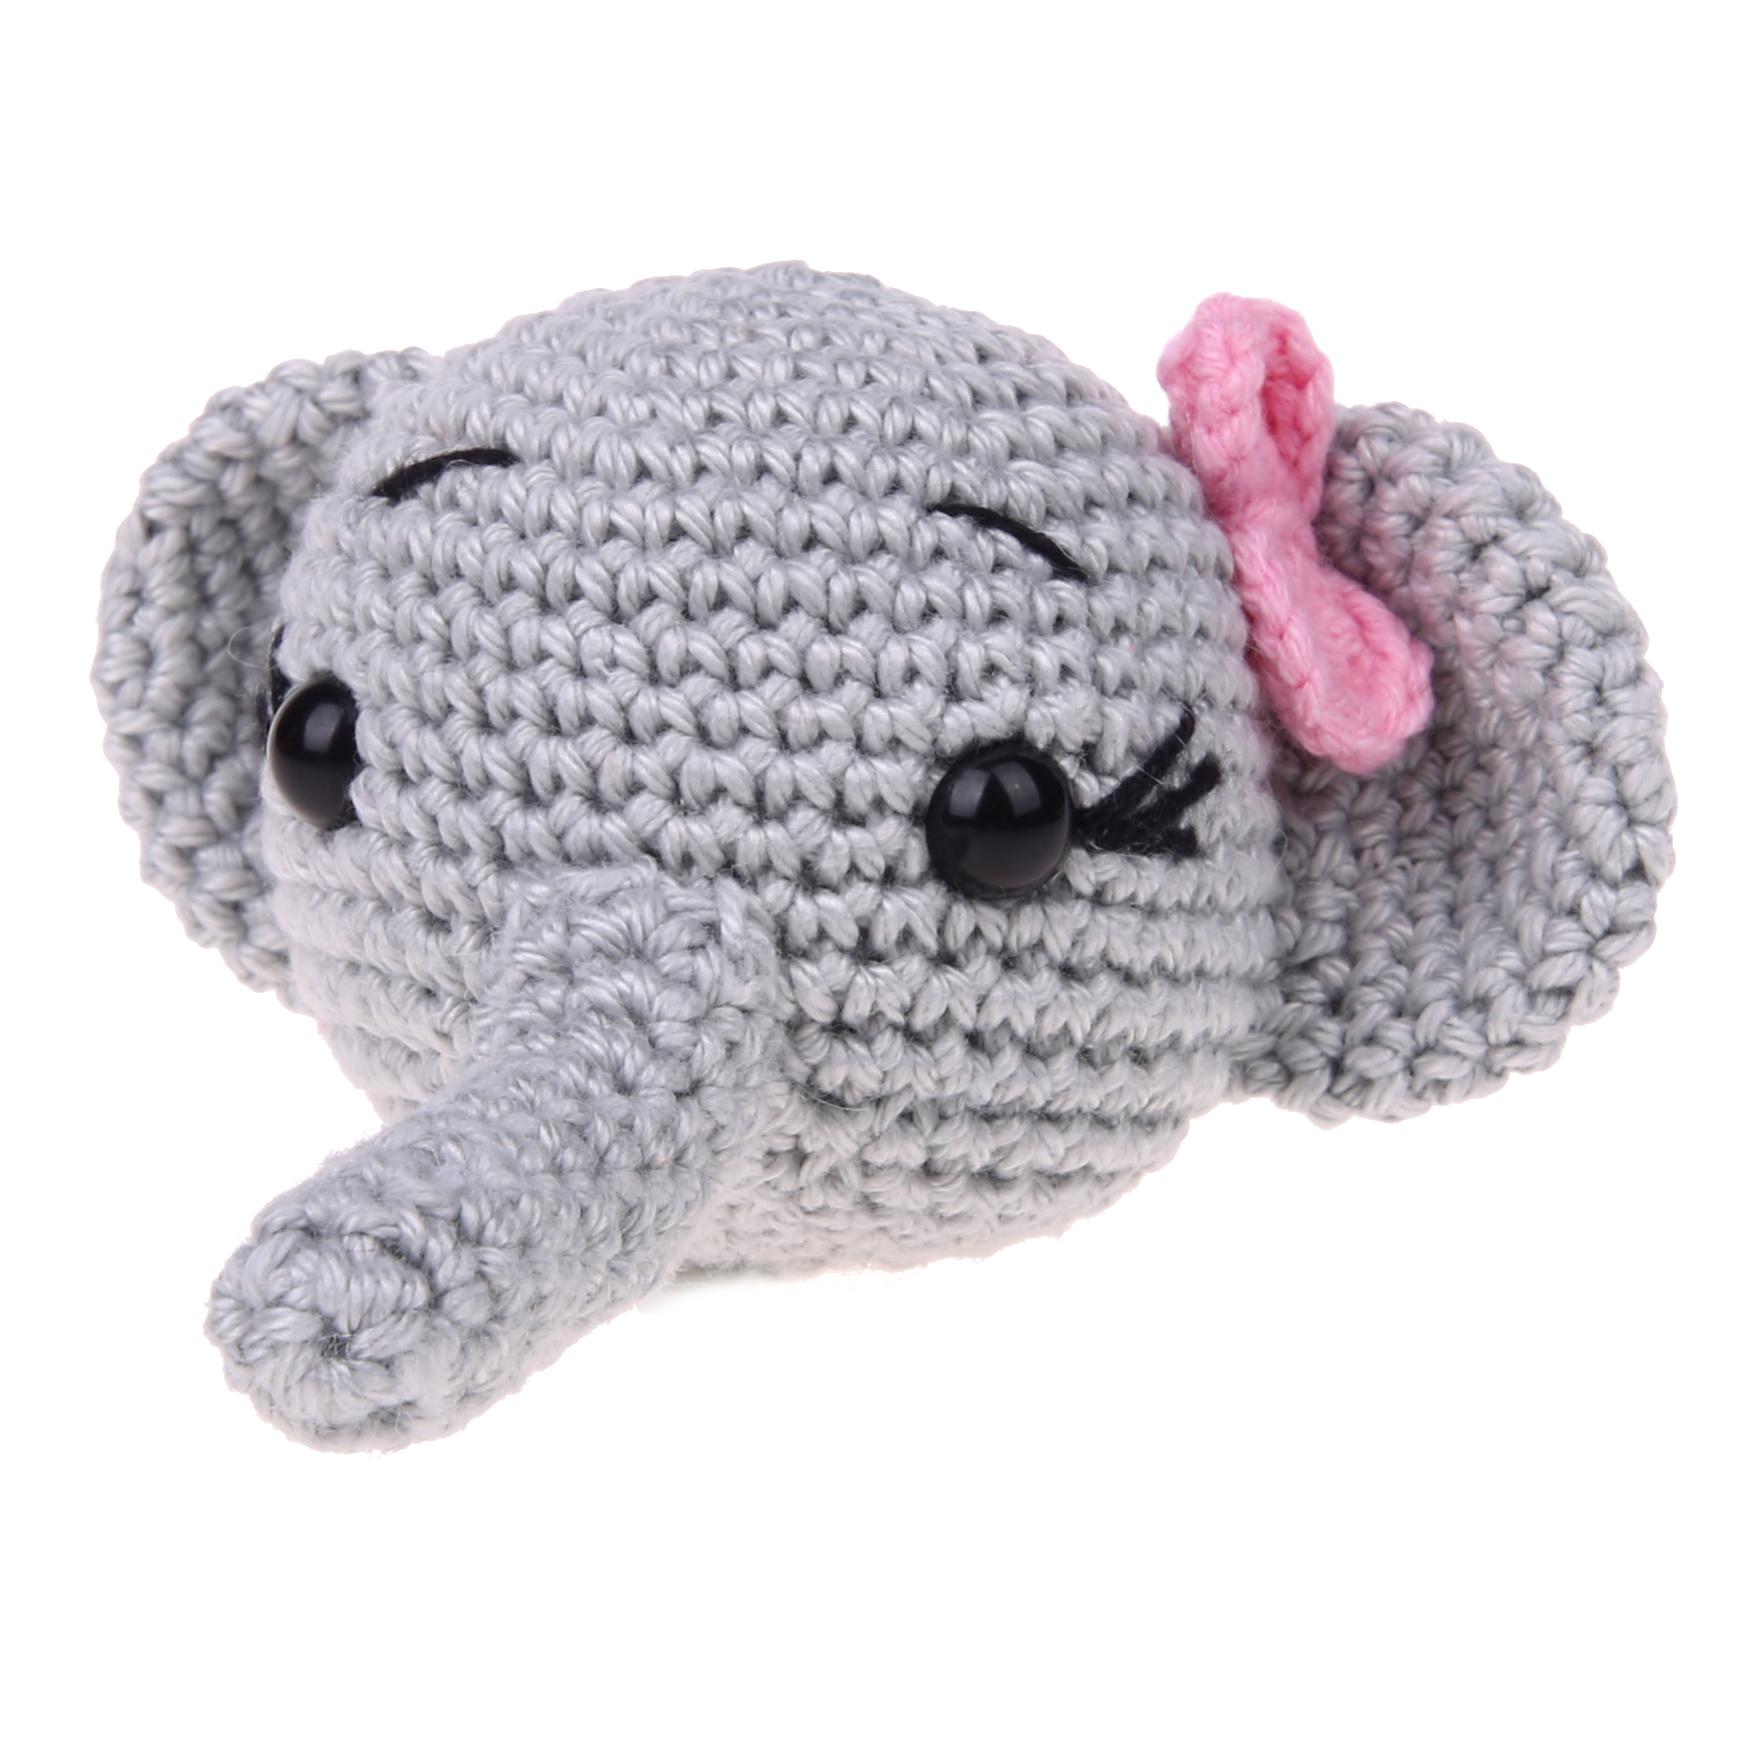 Häkeltier Elefant mit Schleife